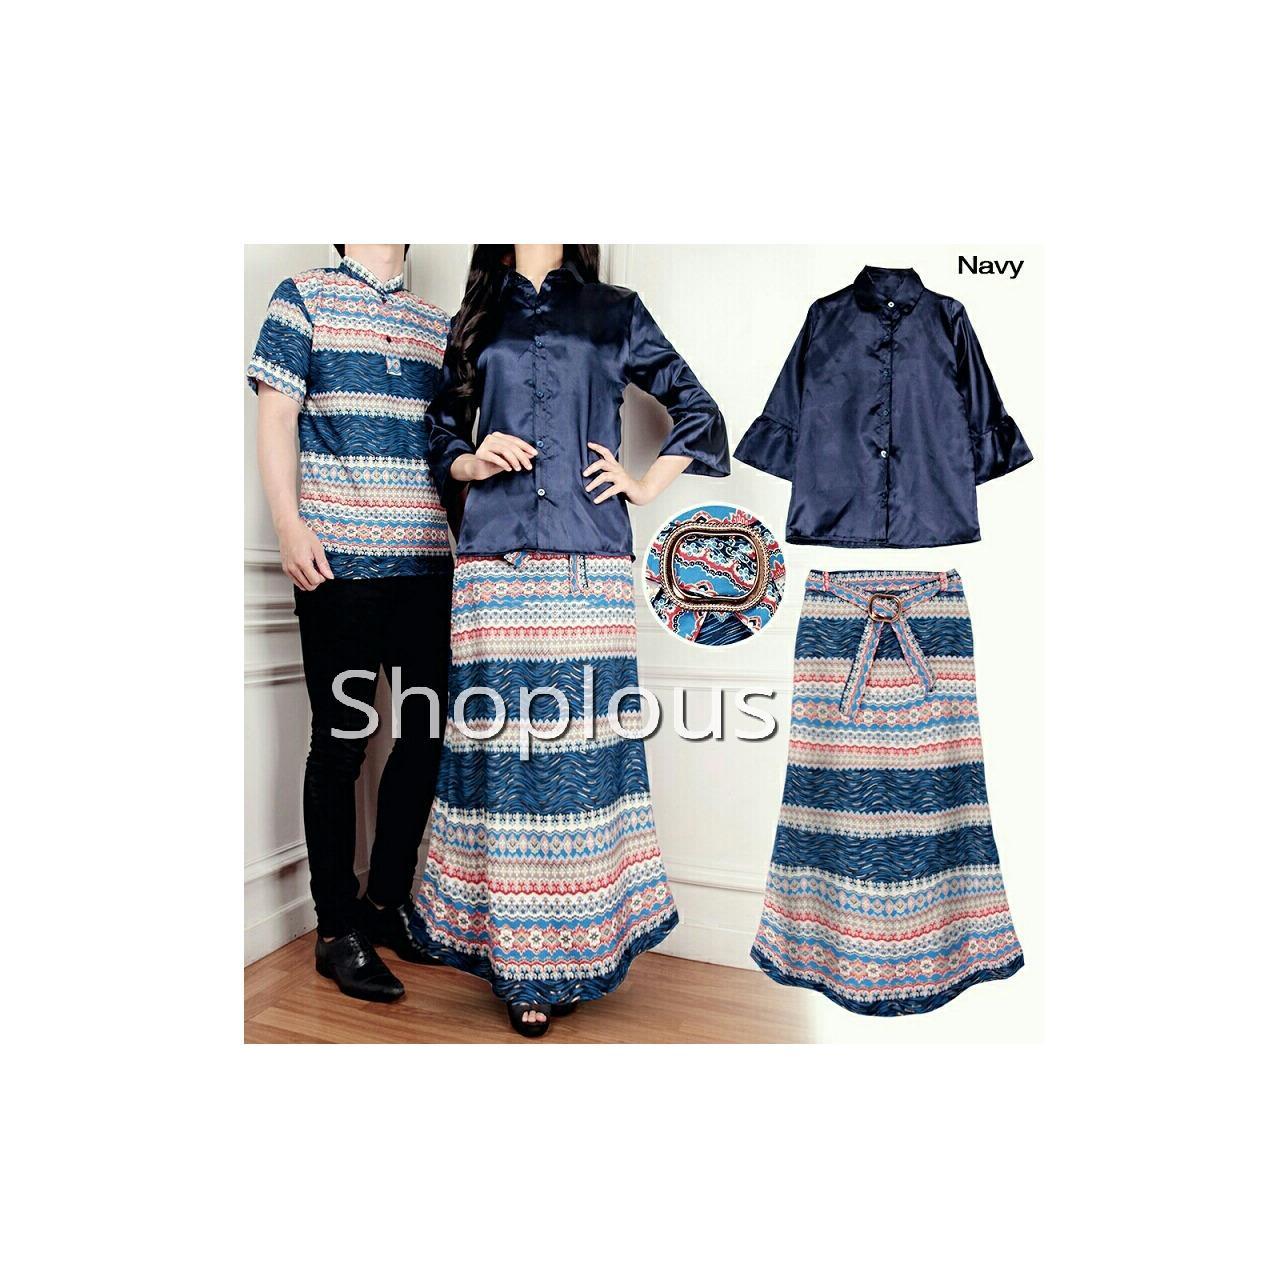 Shoplous Limited stock !Coupel dress ZZ/ Coupel sakira/ Coupel gamis / Baju pesta coupel / baju coupel lebaran/ gamis coupel/ family dress/ family clothes/ baju keluarga